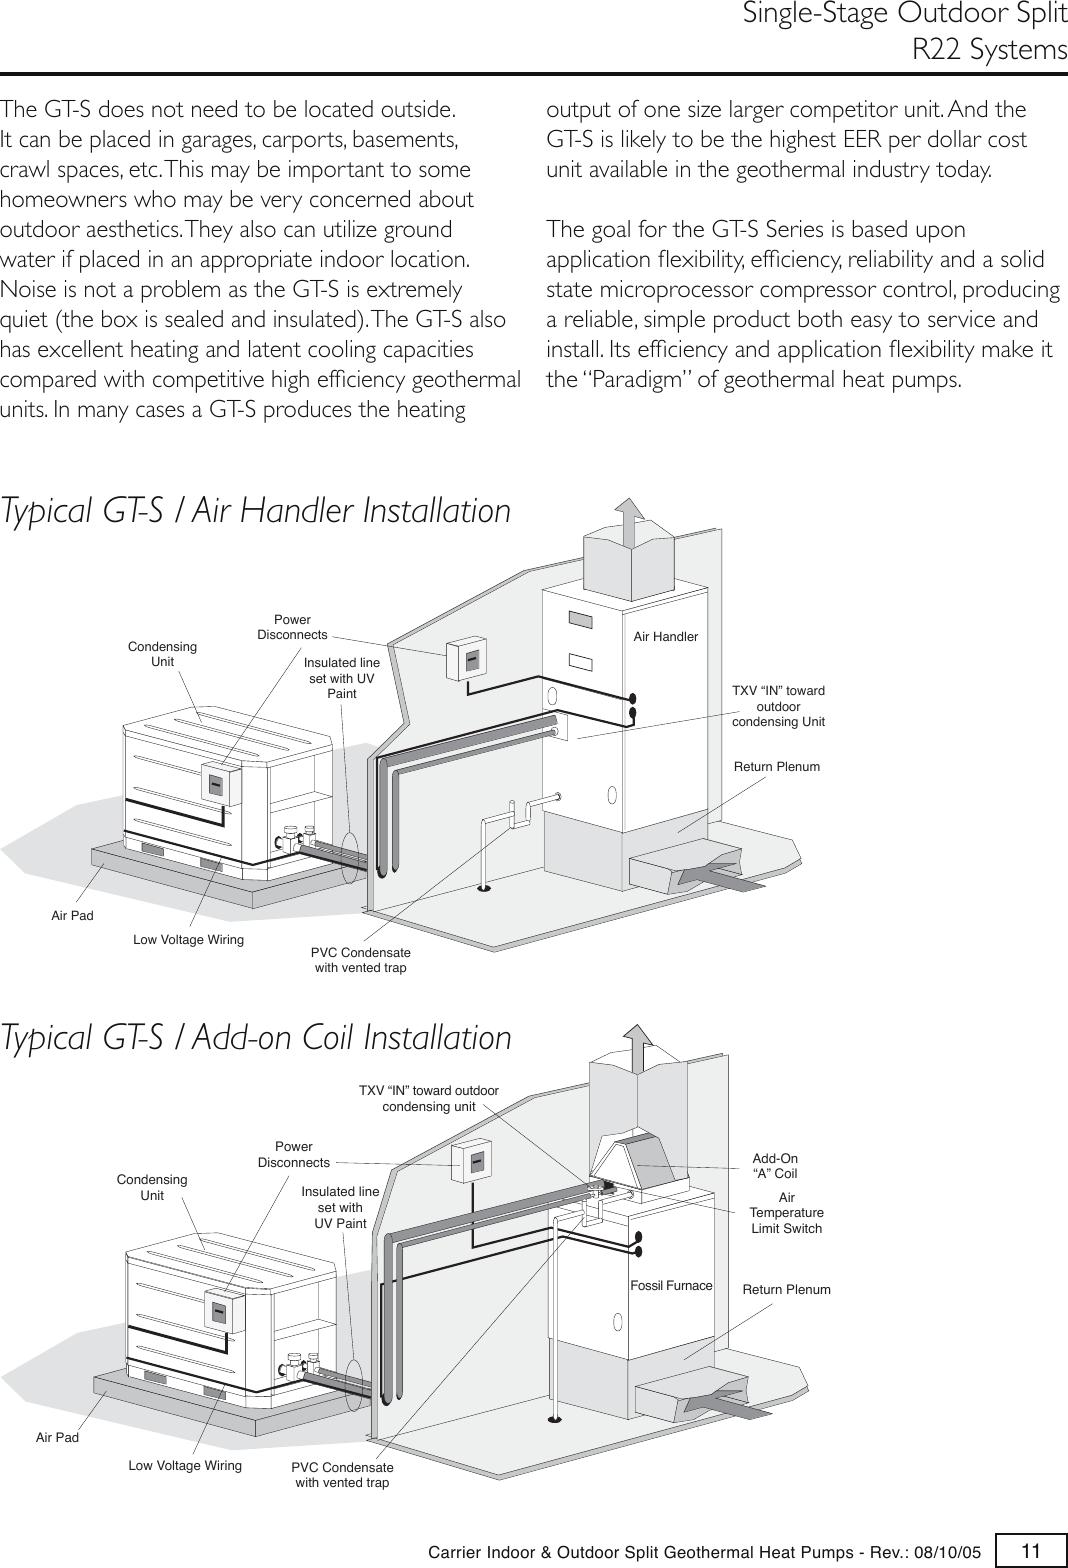 carrier gt g users manualAir Handler Wiring Diagram Carrier Geothermal Heat Further Geothermal #3